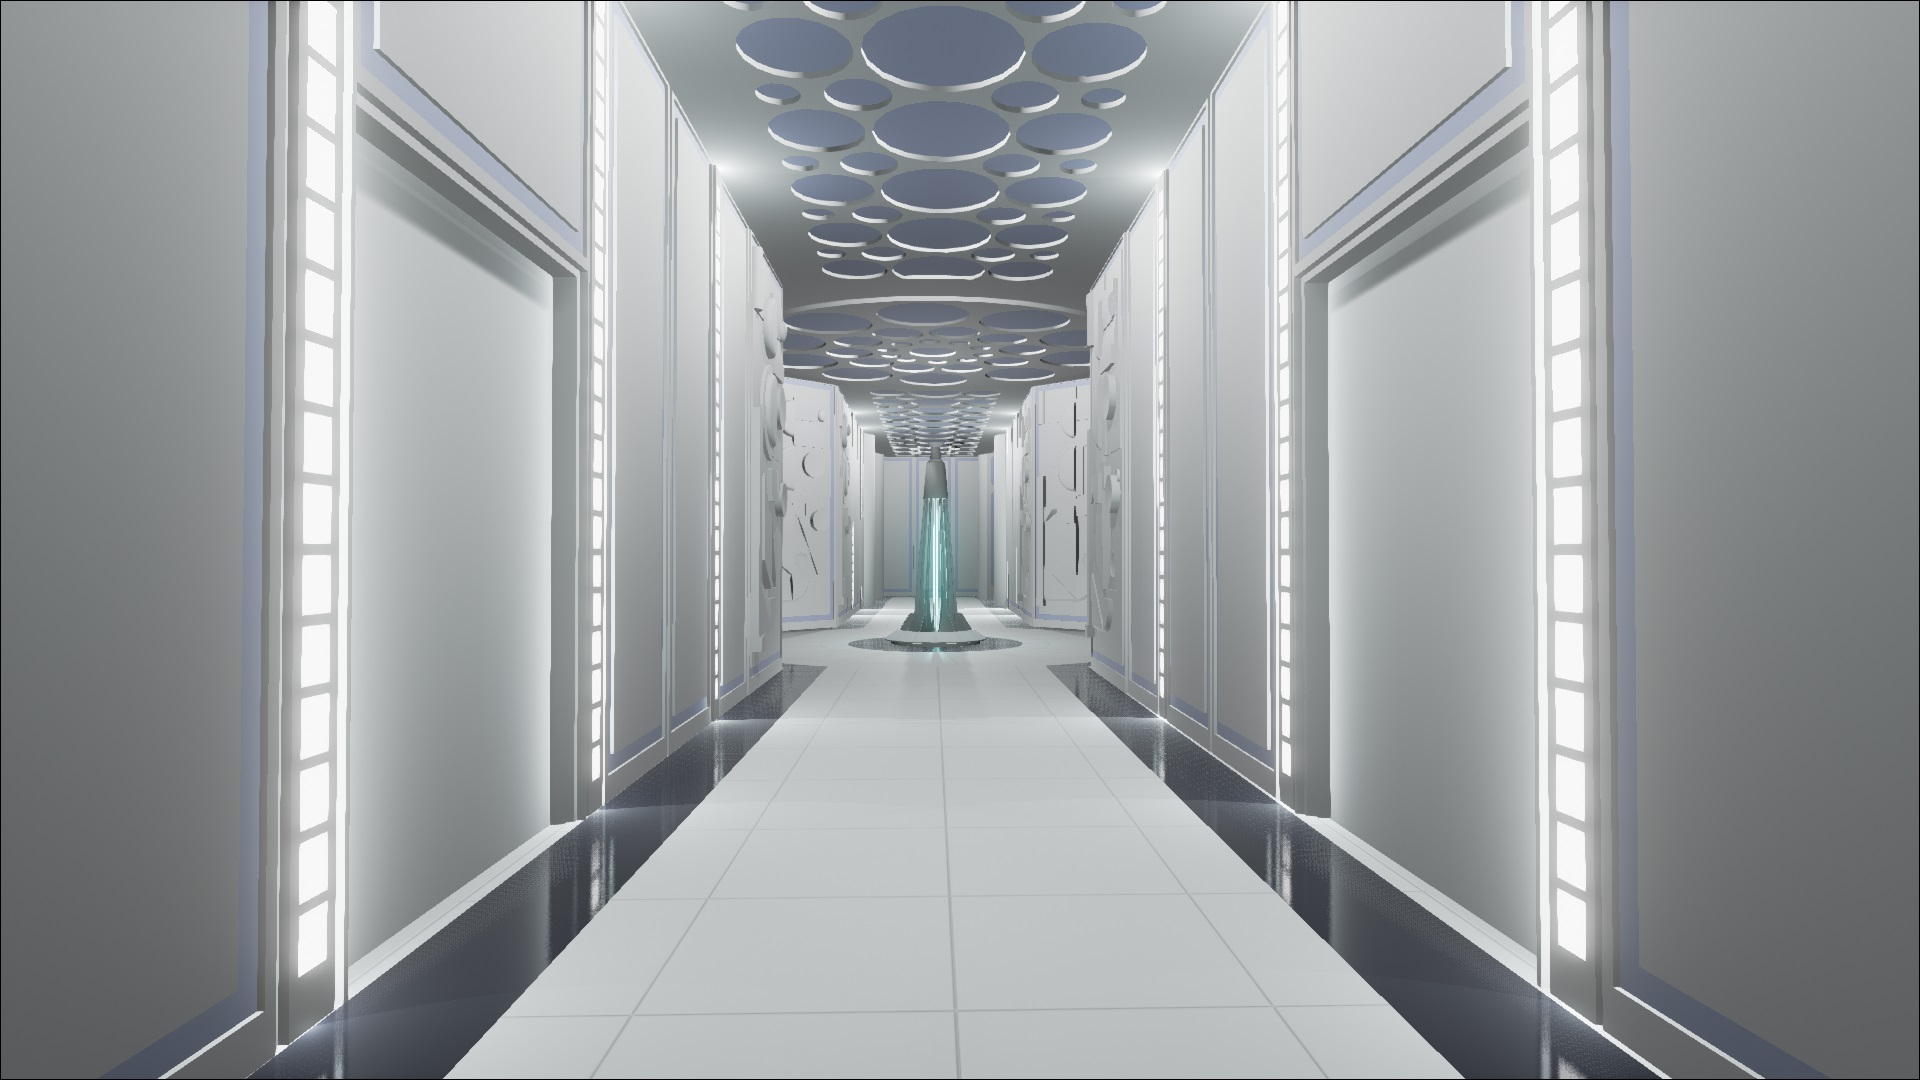 Cloud City Main Hallway Image Star Wars Battlecry